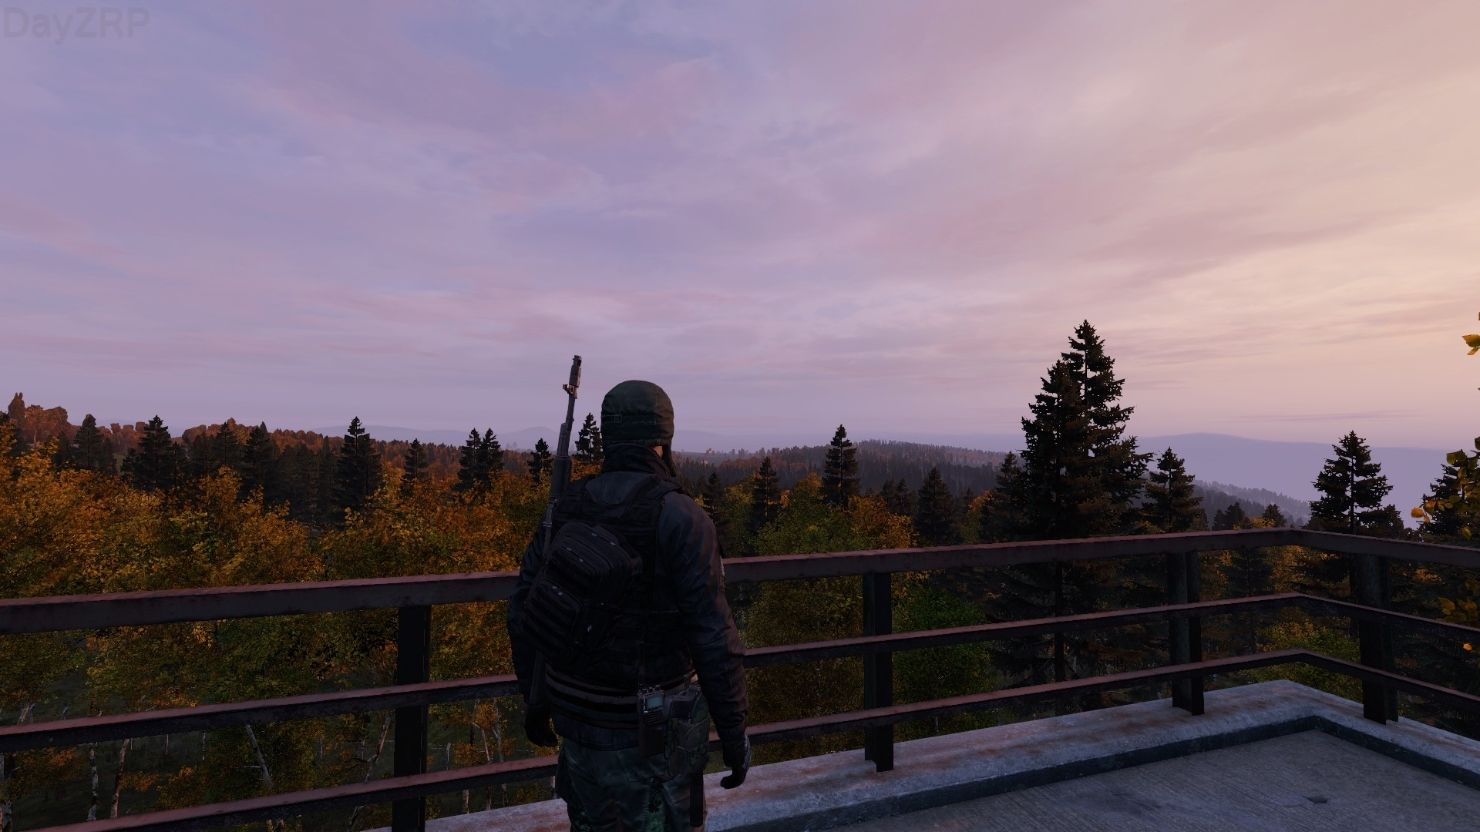 The morning rises.